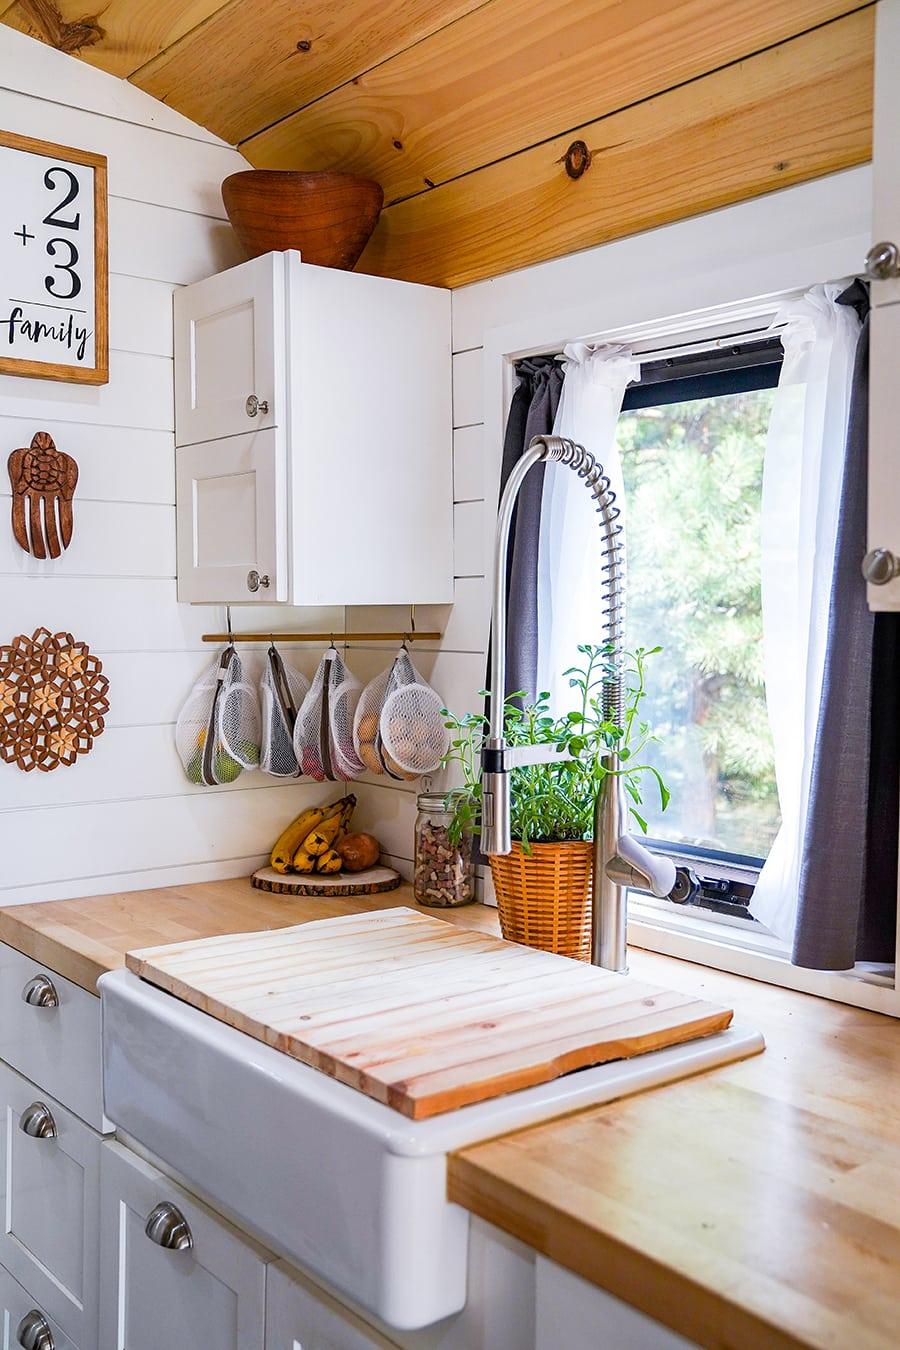 Modern tiny kitchen inside school bus @happyhomebodies